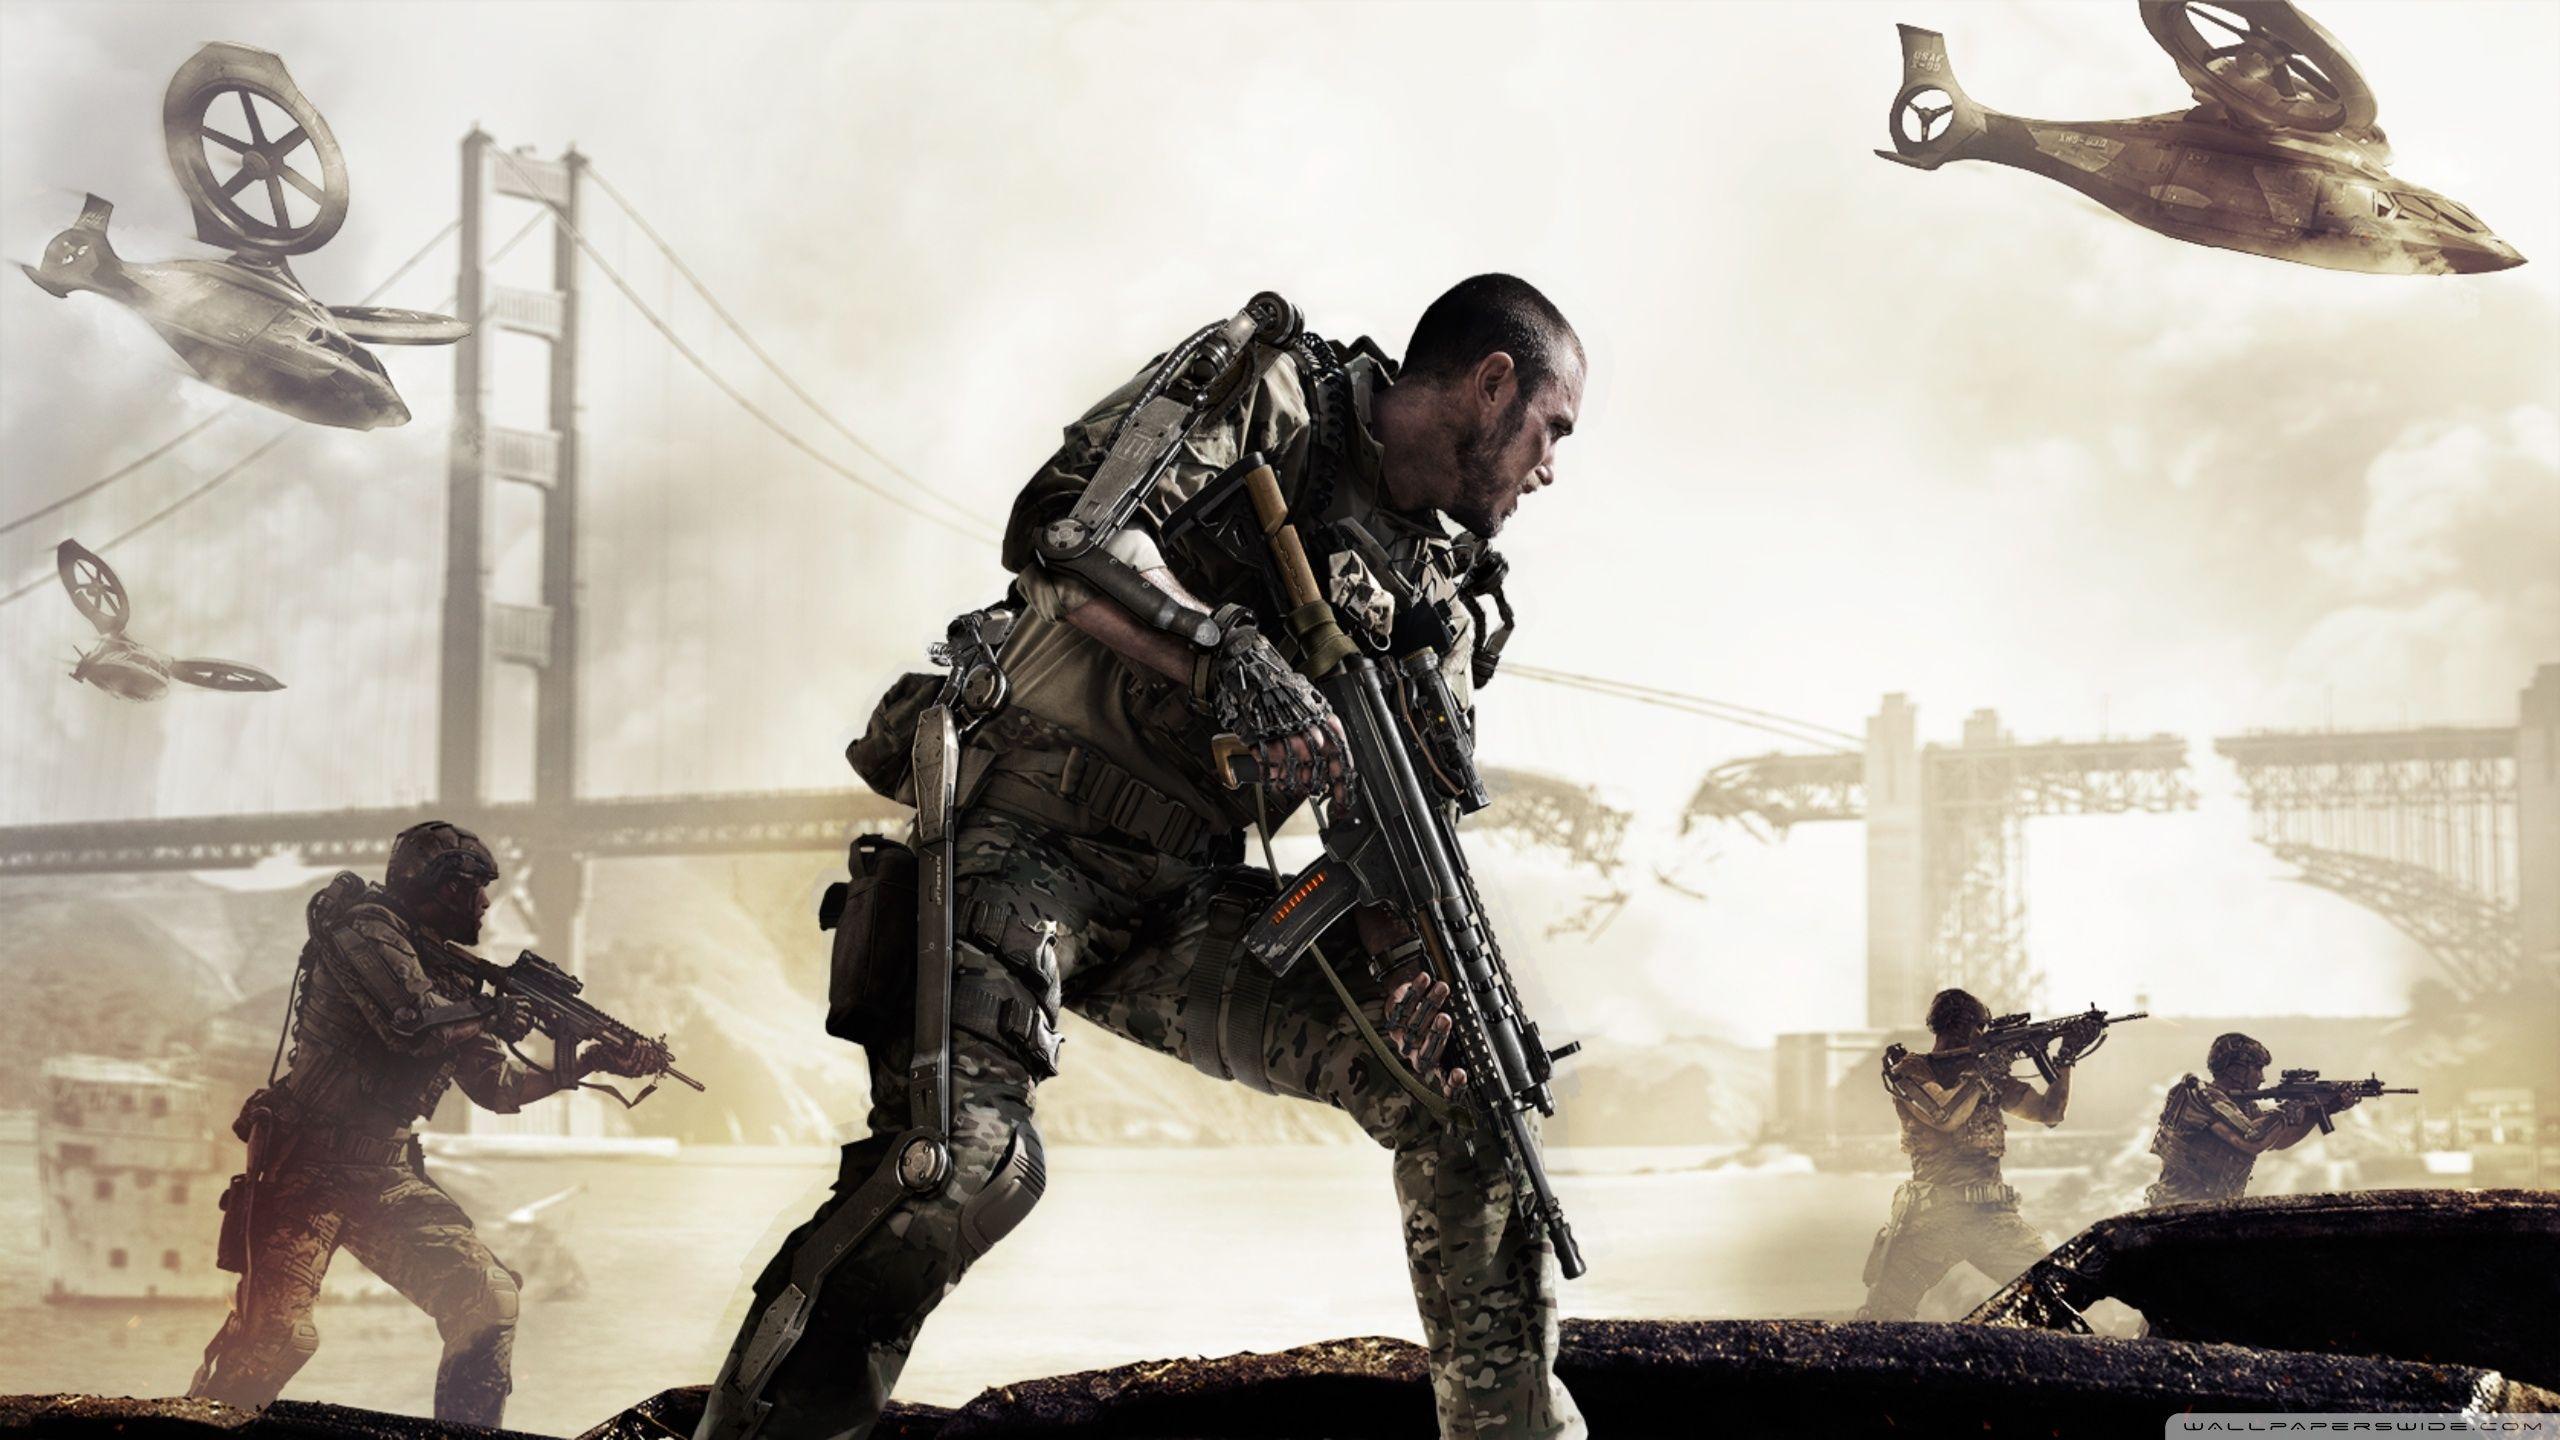 Call Of Duty Advanced Warfare Wallpapers Top Free Call Of Duty Advanced Warfare Backgrounds Wallpaperaccess